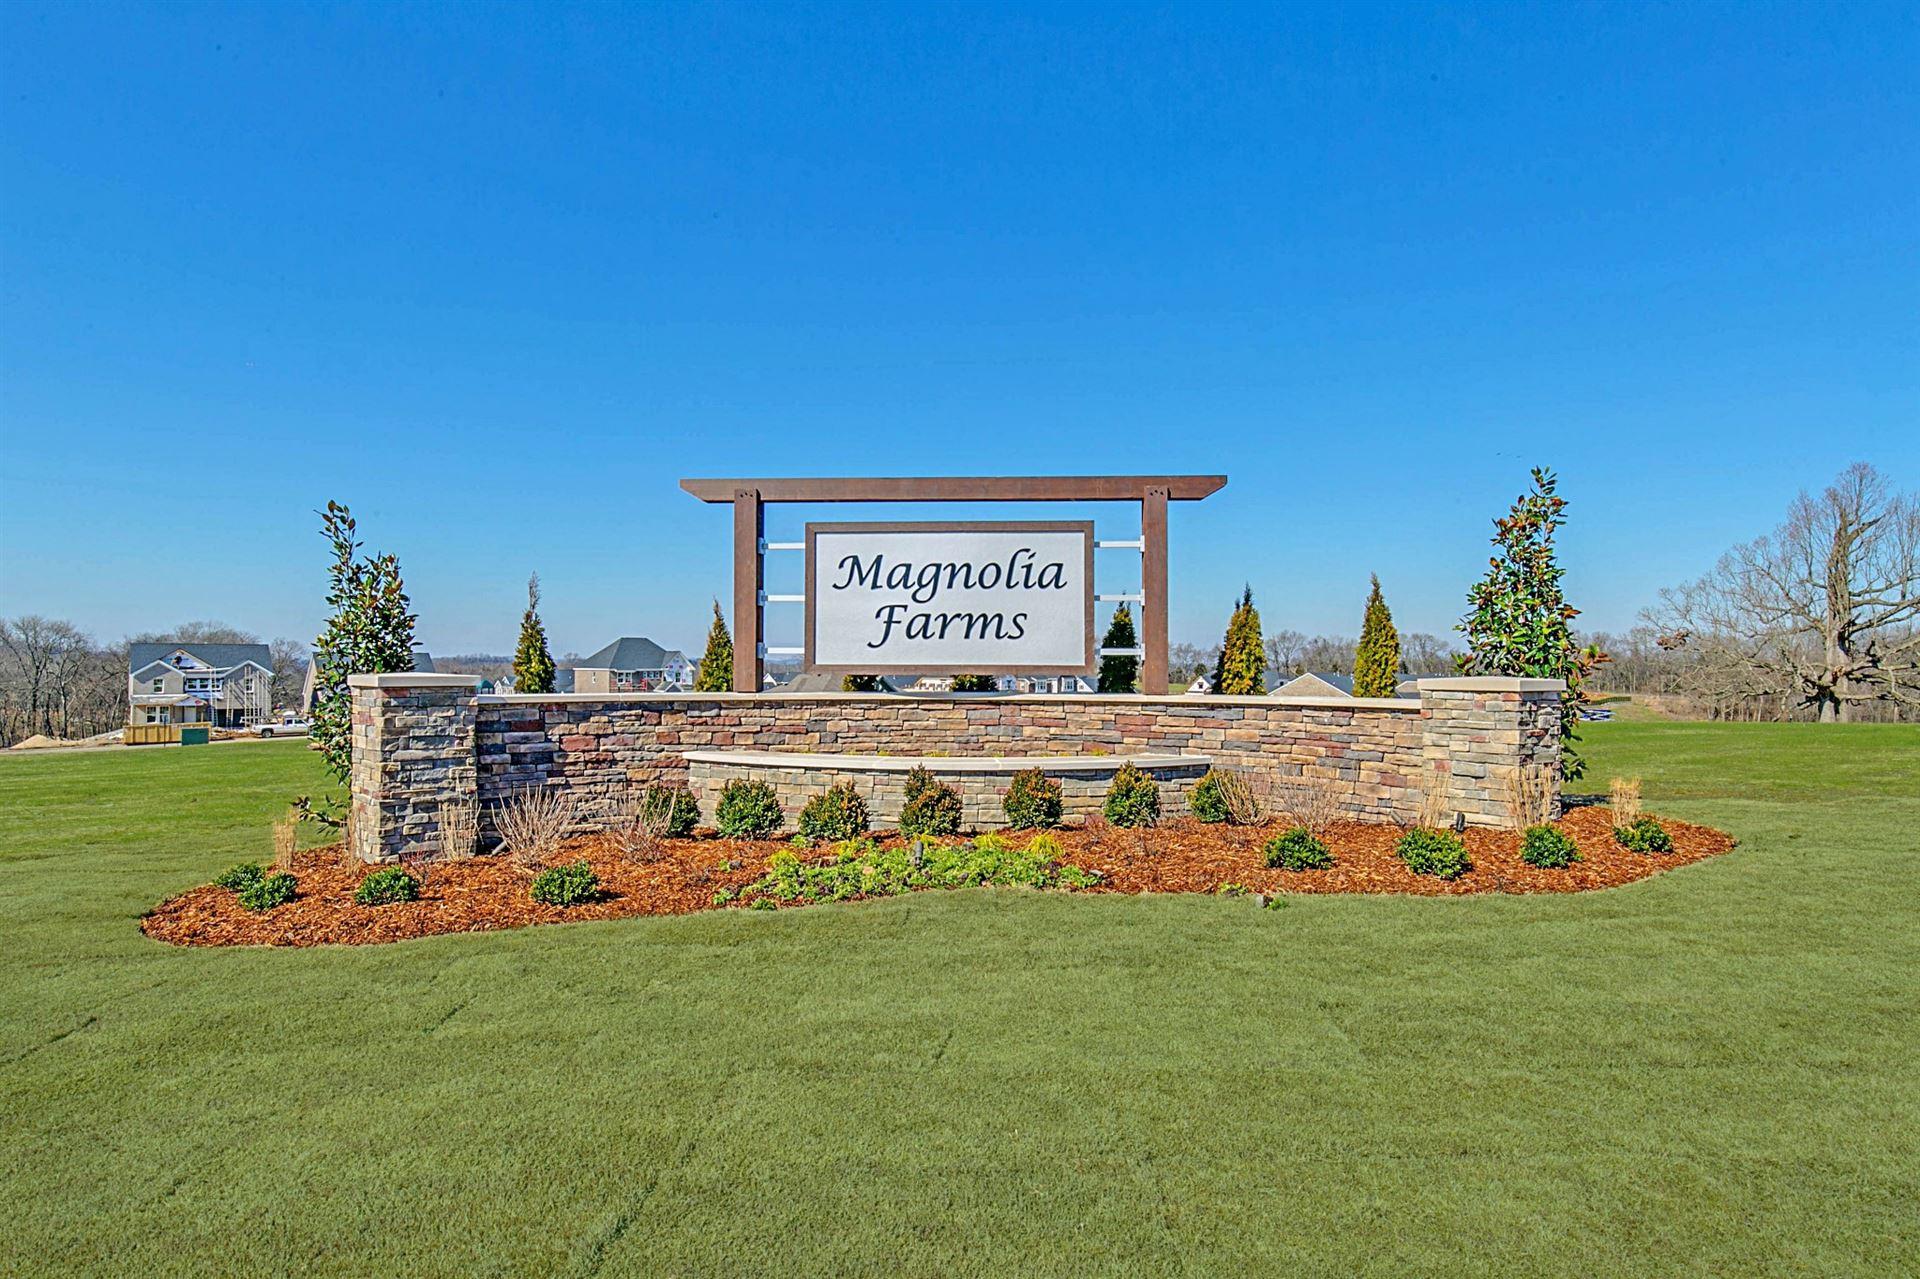 4077 Magnolia Farms Drive, Hermitage, TN 37076 - MLS#: 2186781